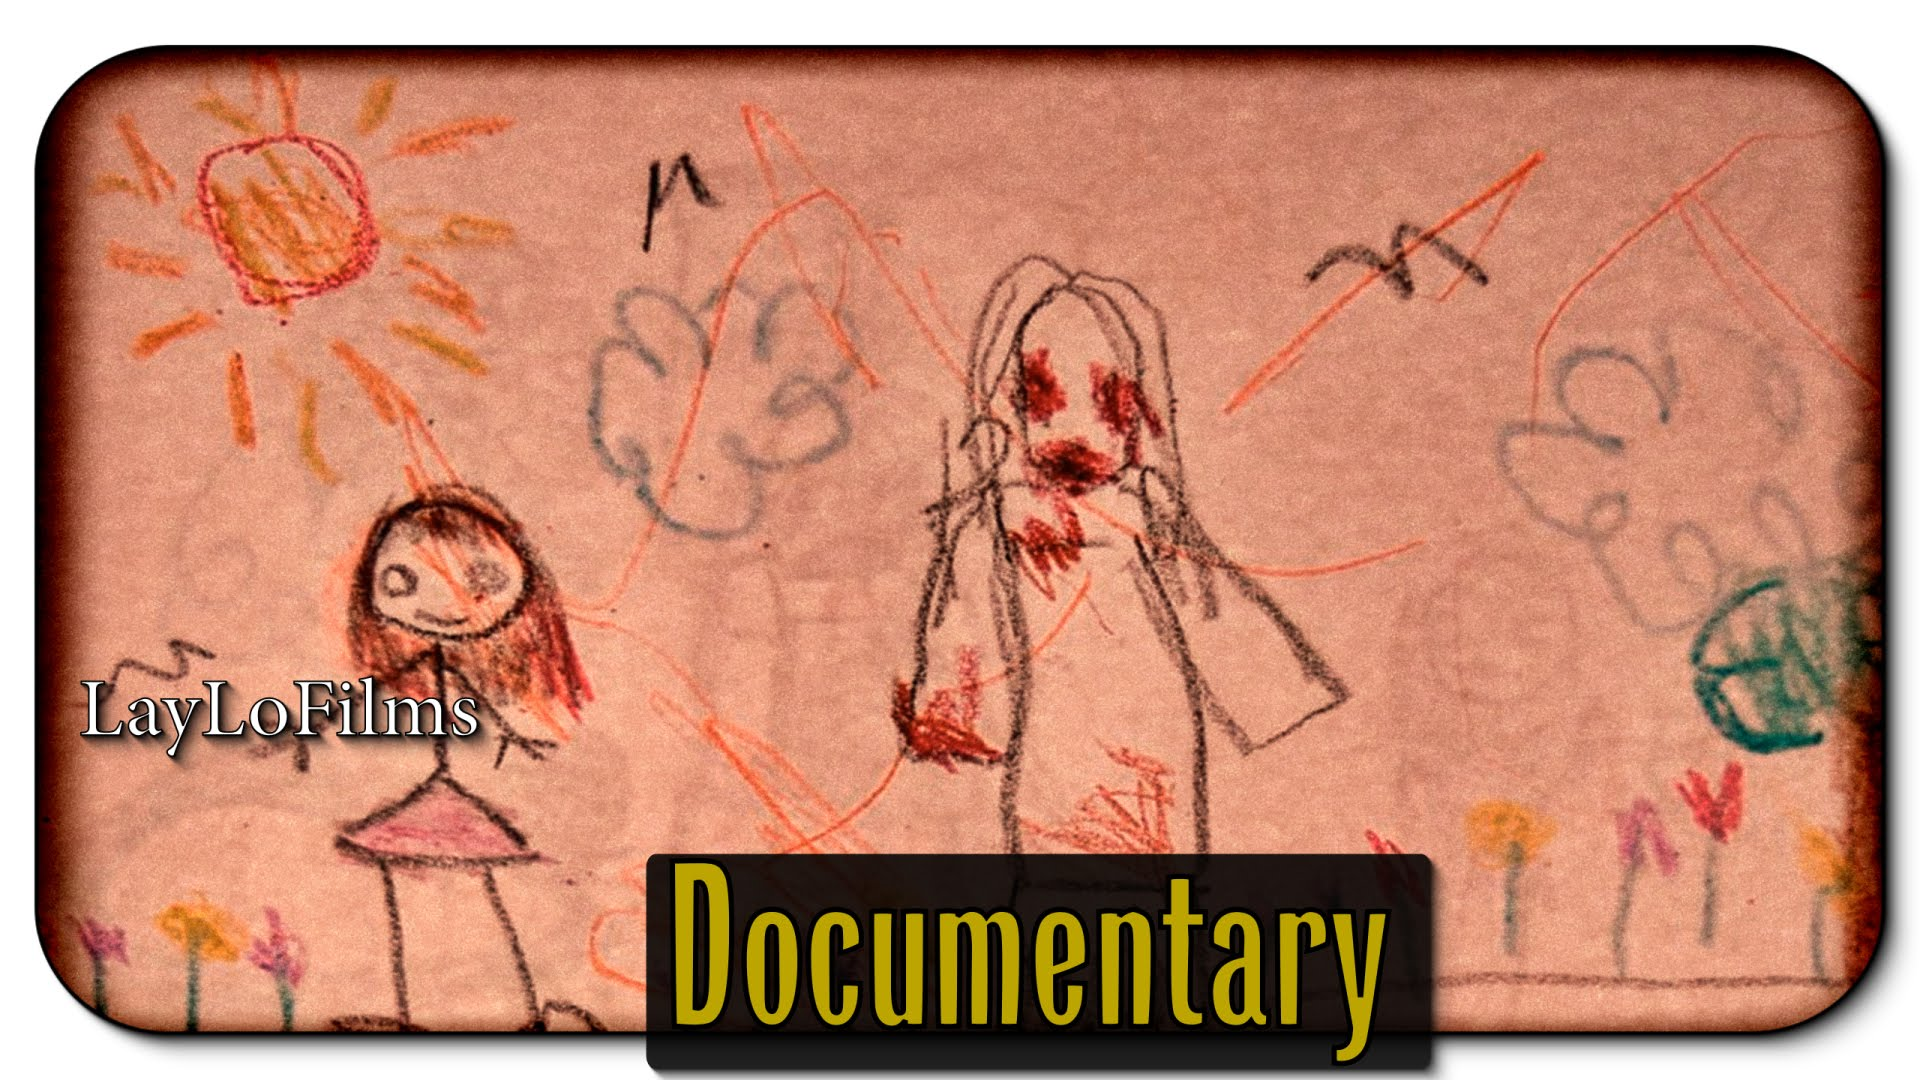 1920x1080 Disturbing Children's Drawings (The Story Of Lisa)